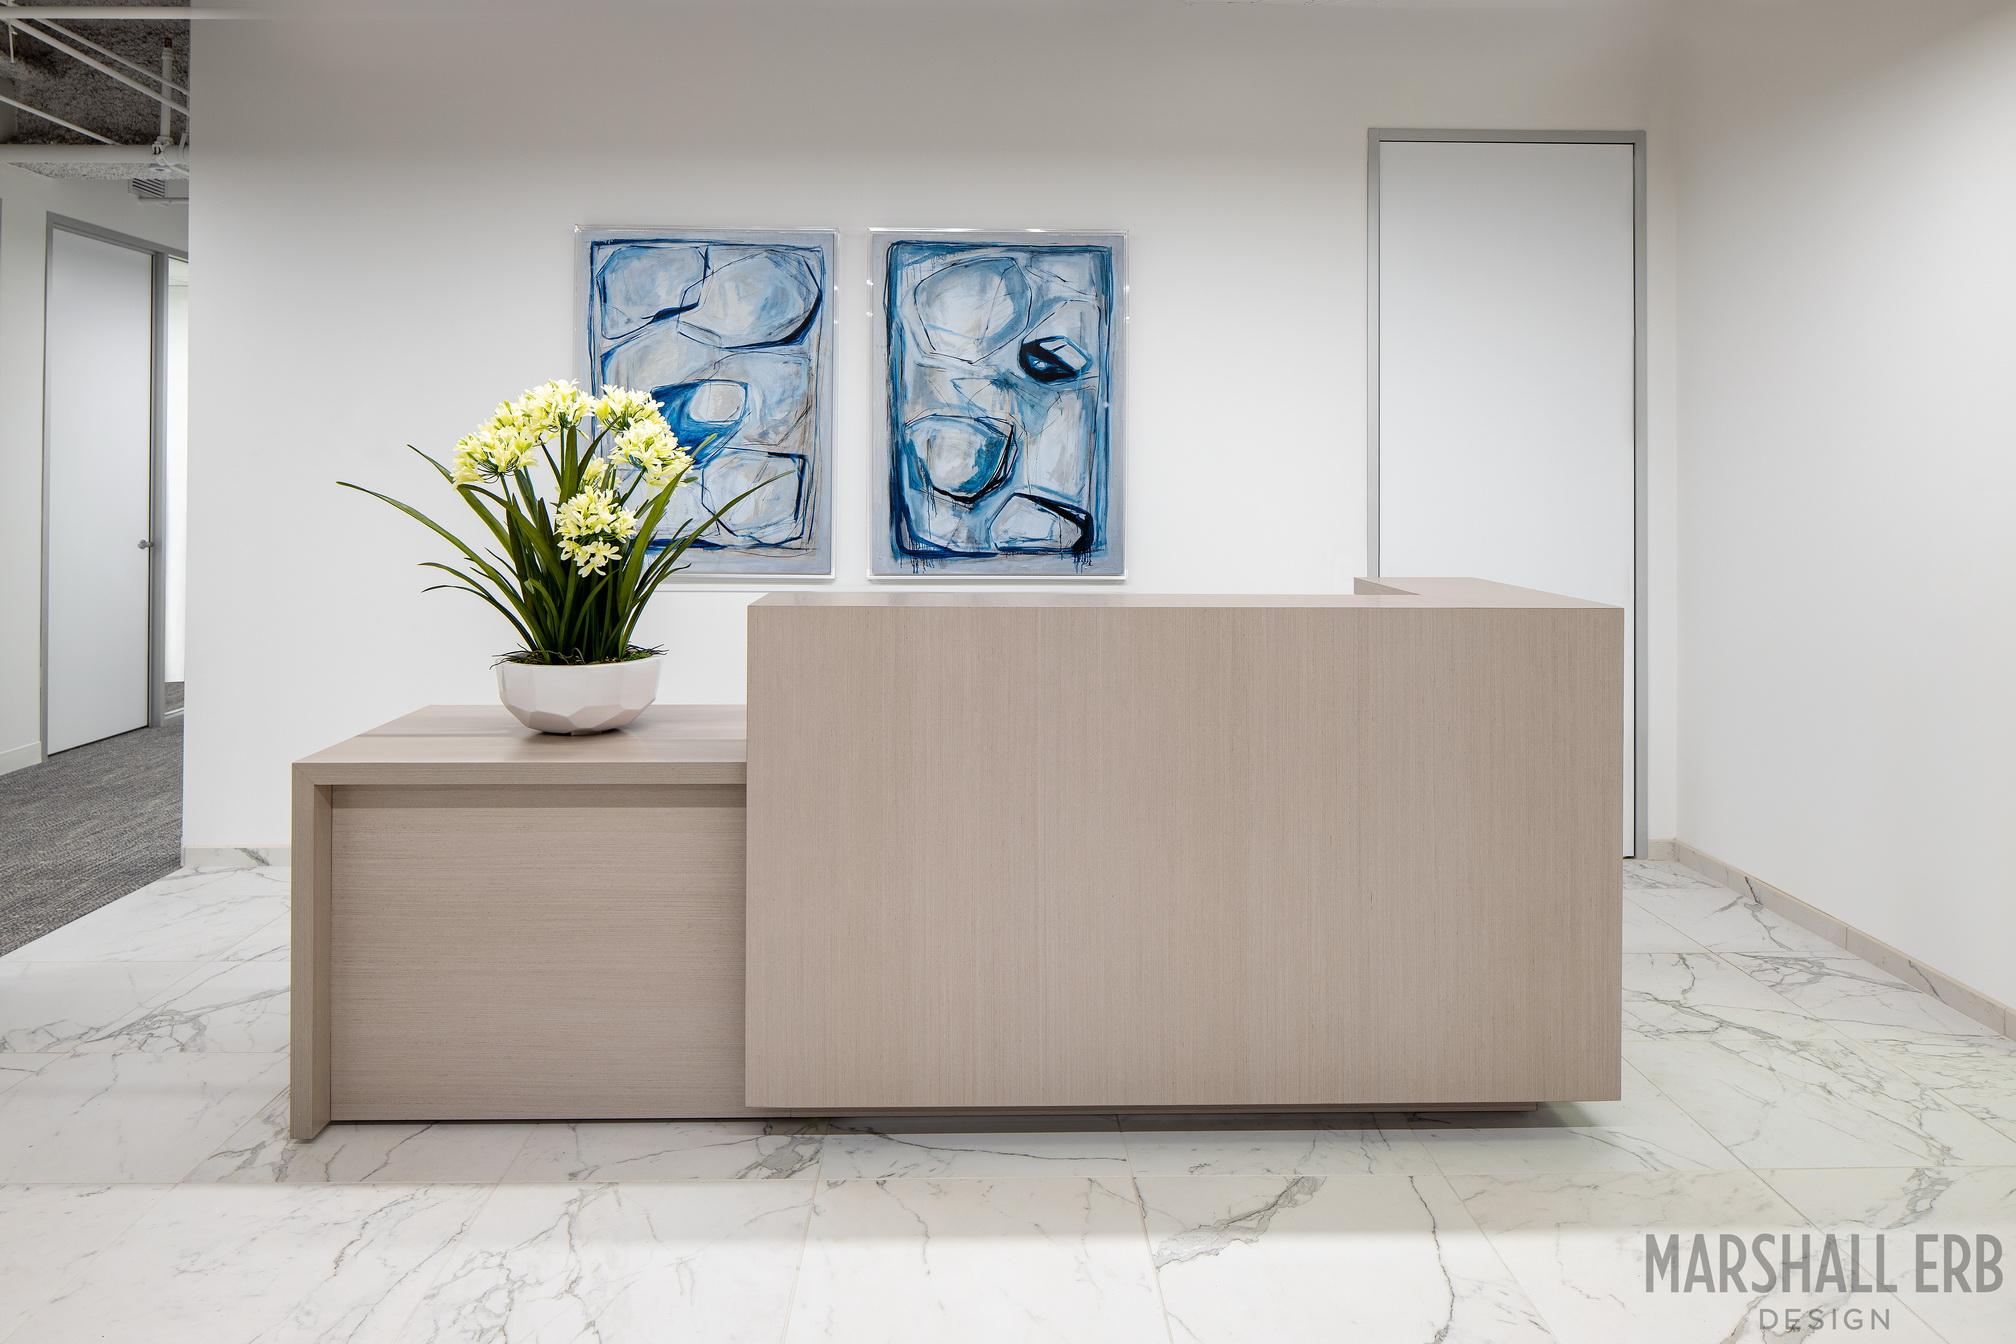 Marshall_Erb_Design_Sweeney_Scharkey_Blanchard_ASID_Award_Winning_Office_2